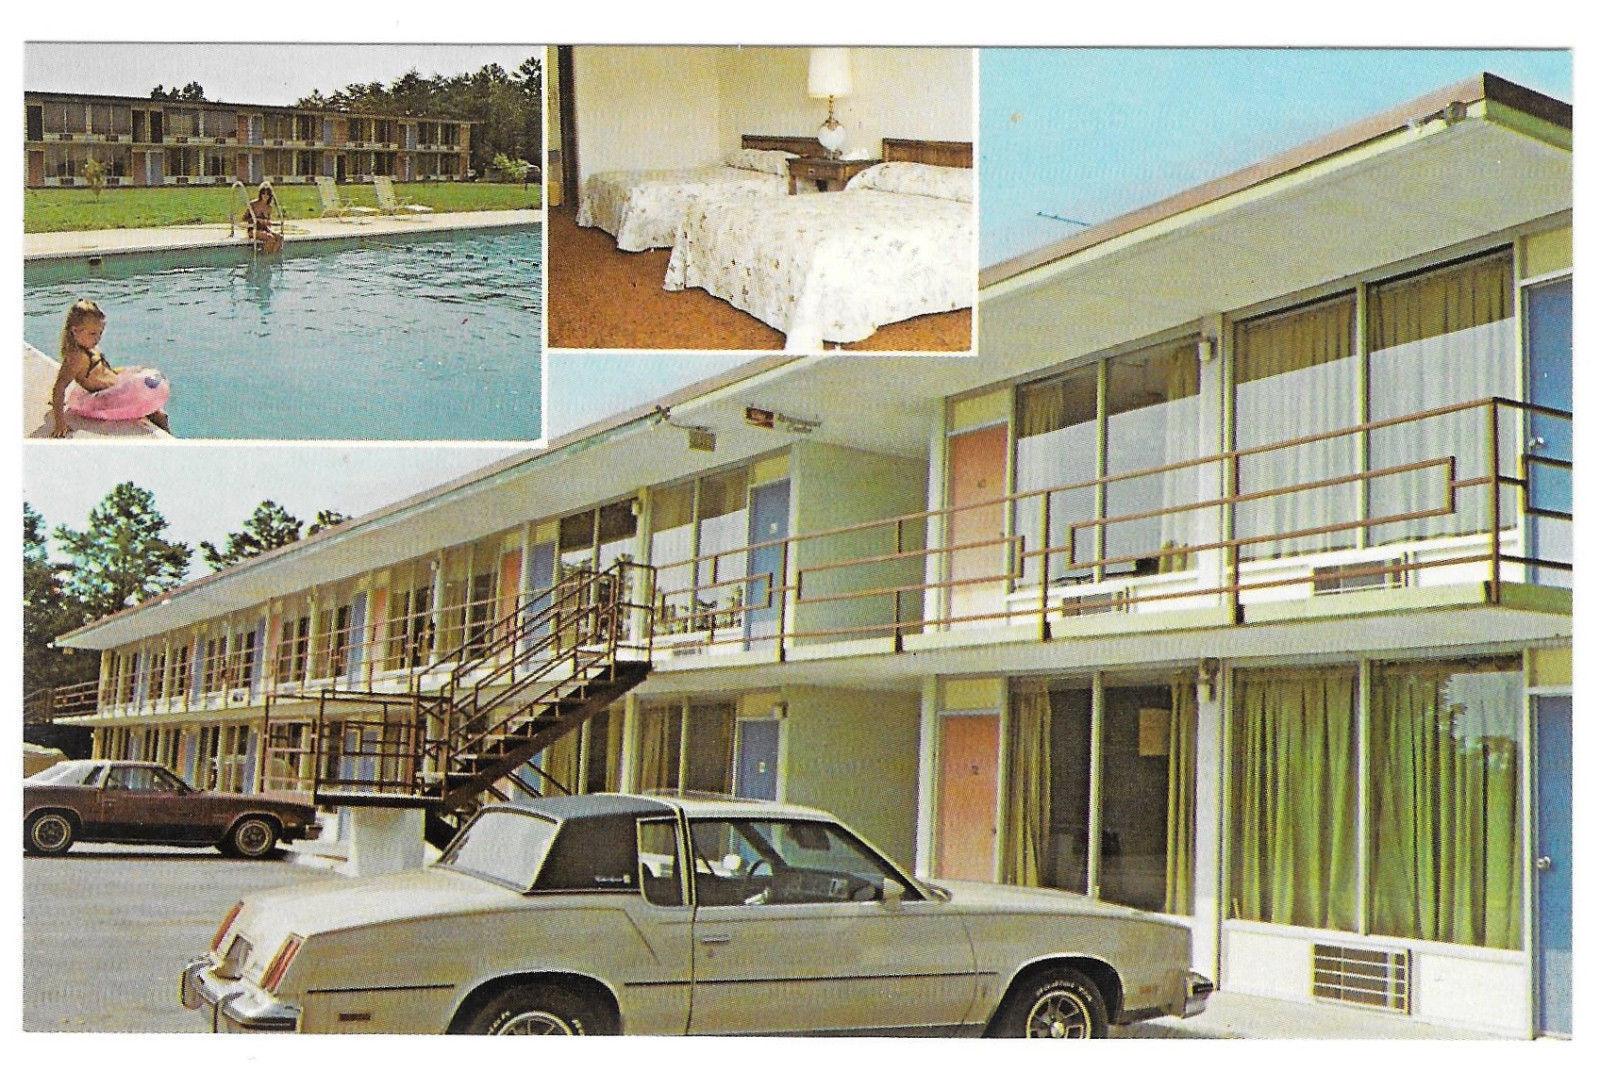 Helton Inn White Pine Tennessee TN Vintage Hotel Motel Postcard Rte 1